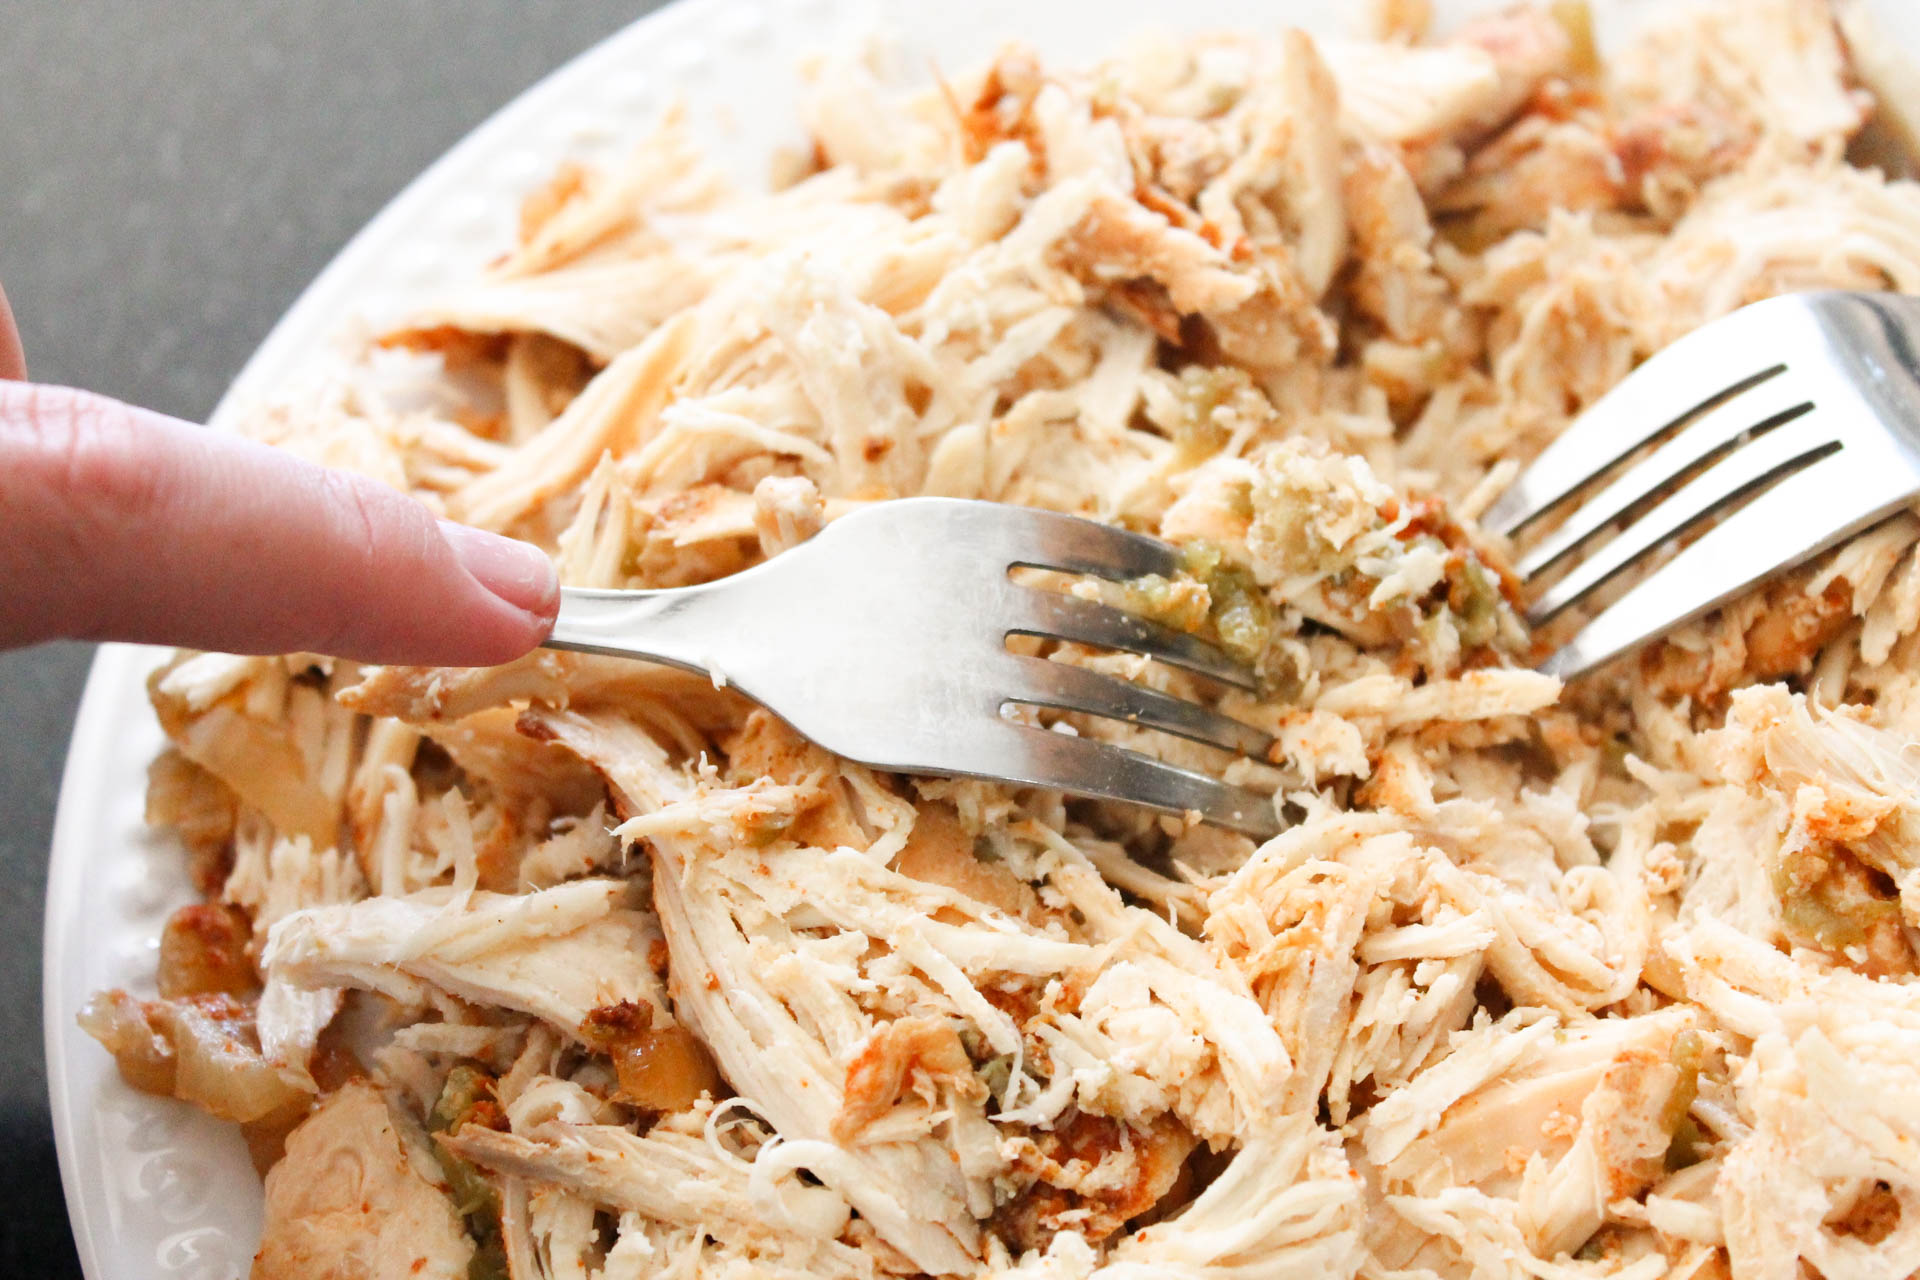 Shredded chicken for Slow Cooker Cheesy Chicken Enchiladas